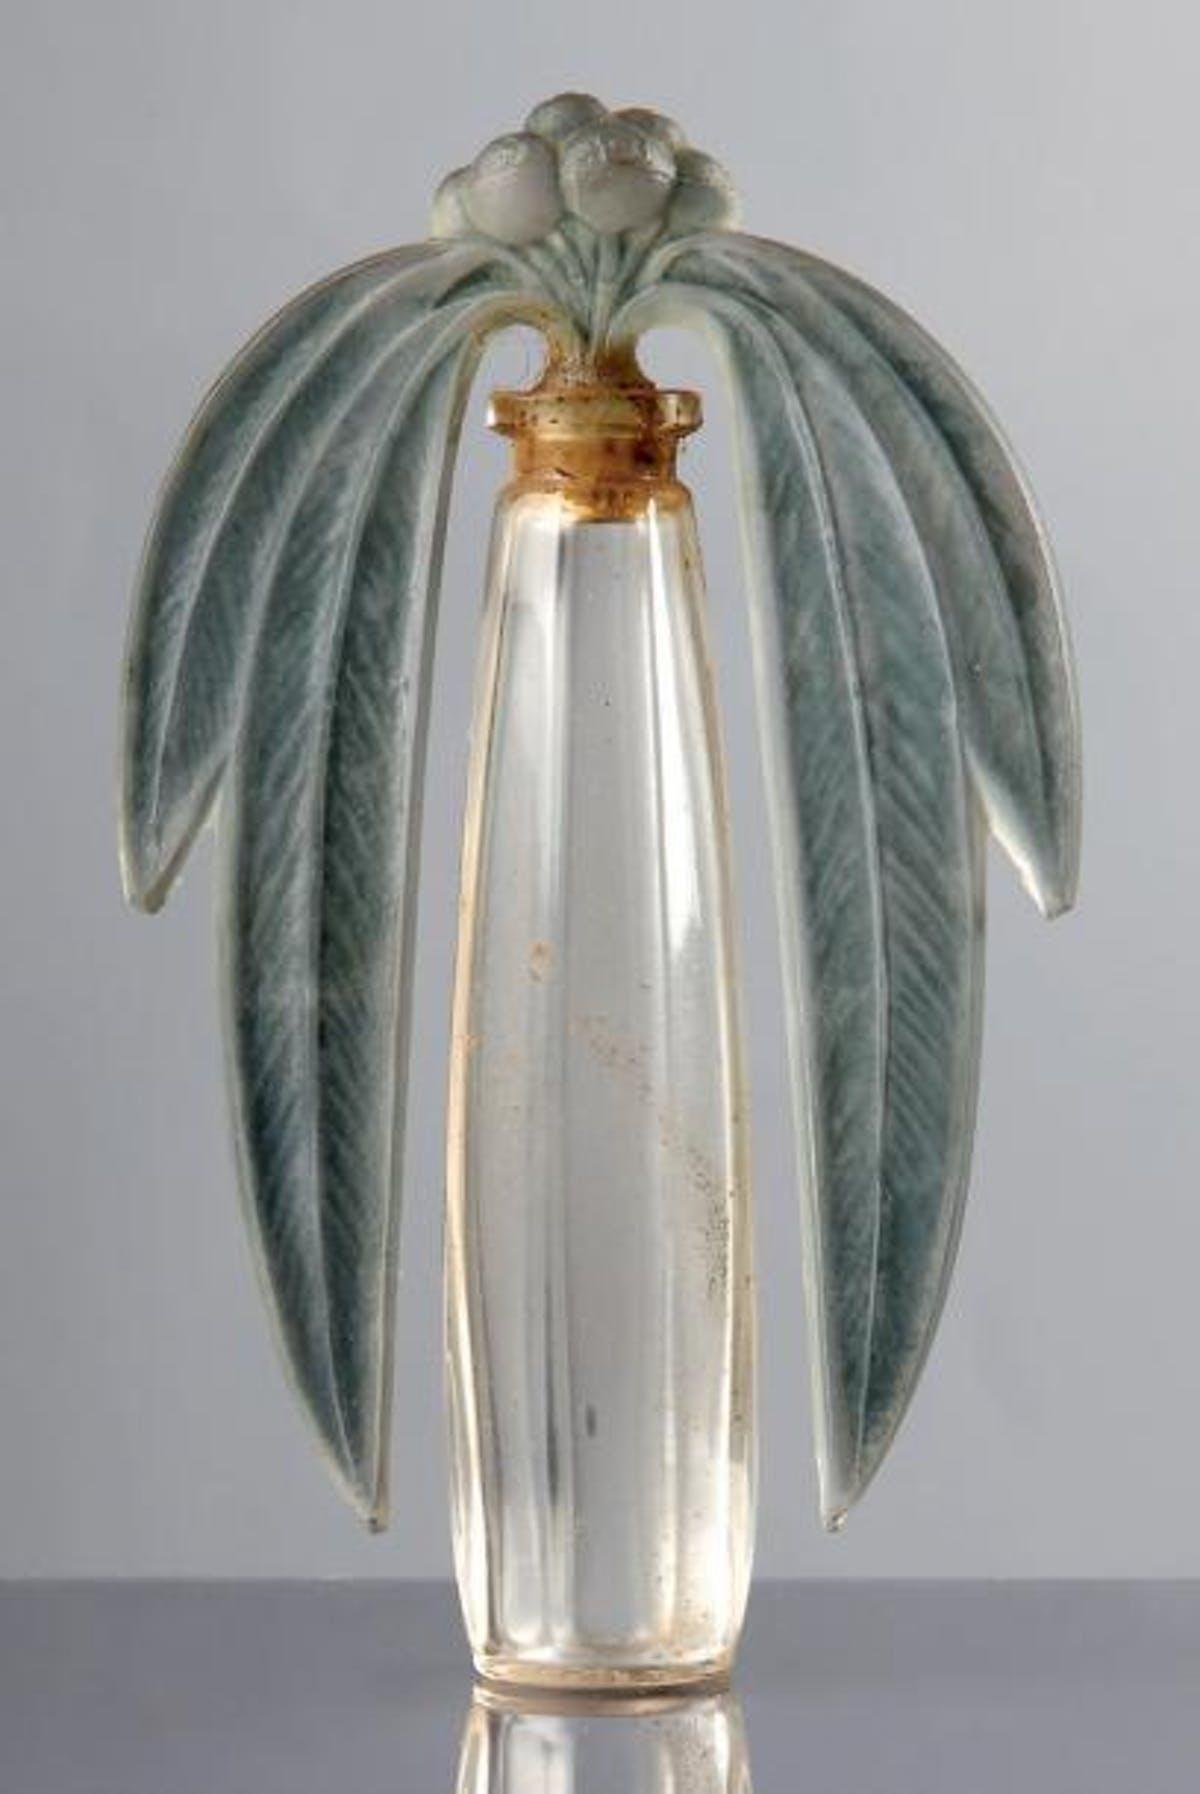 René Lalique, Parfymflaska 'Eucalyptus' från 1919. Bild: Barnebys